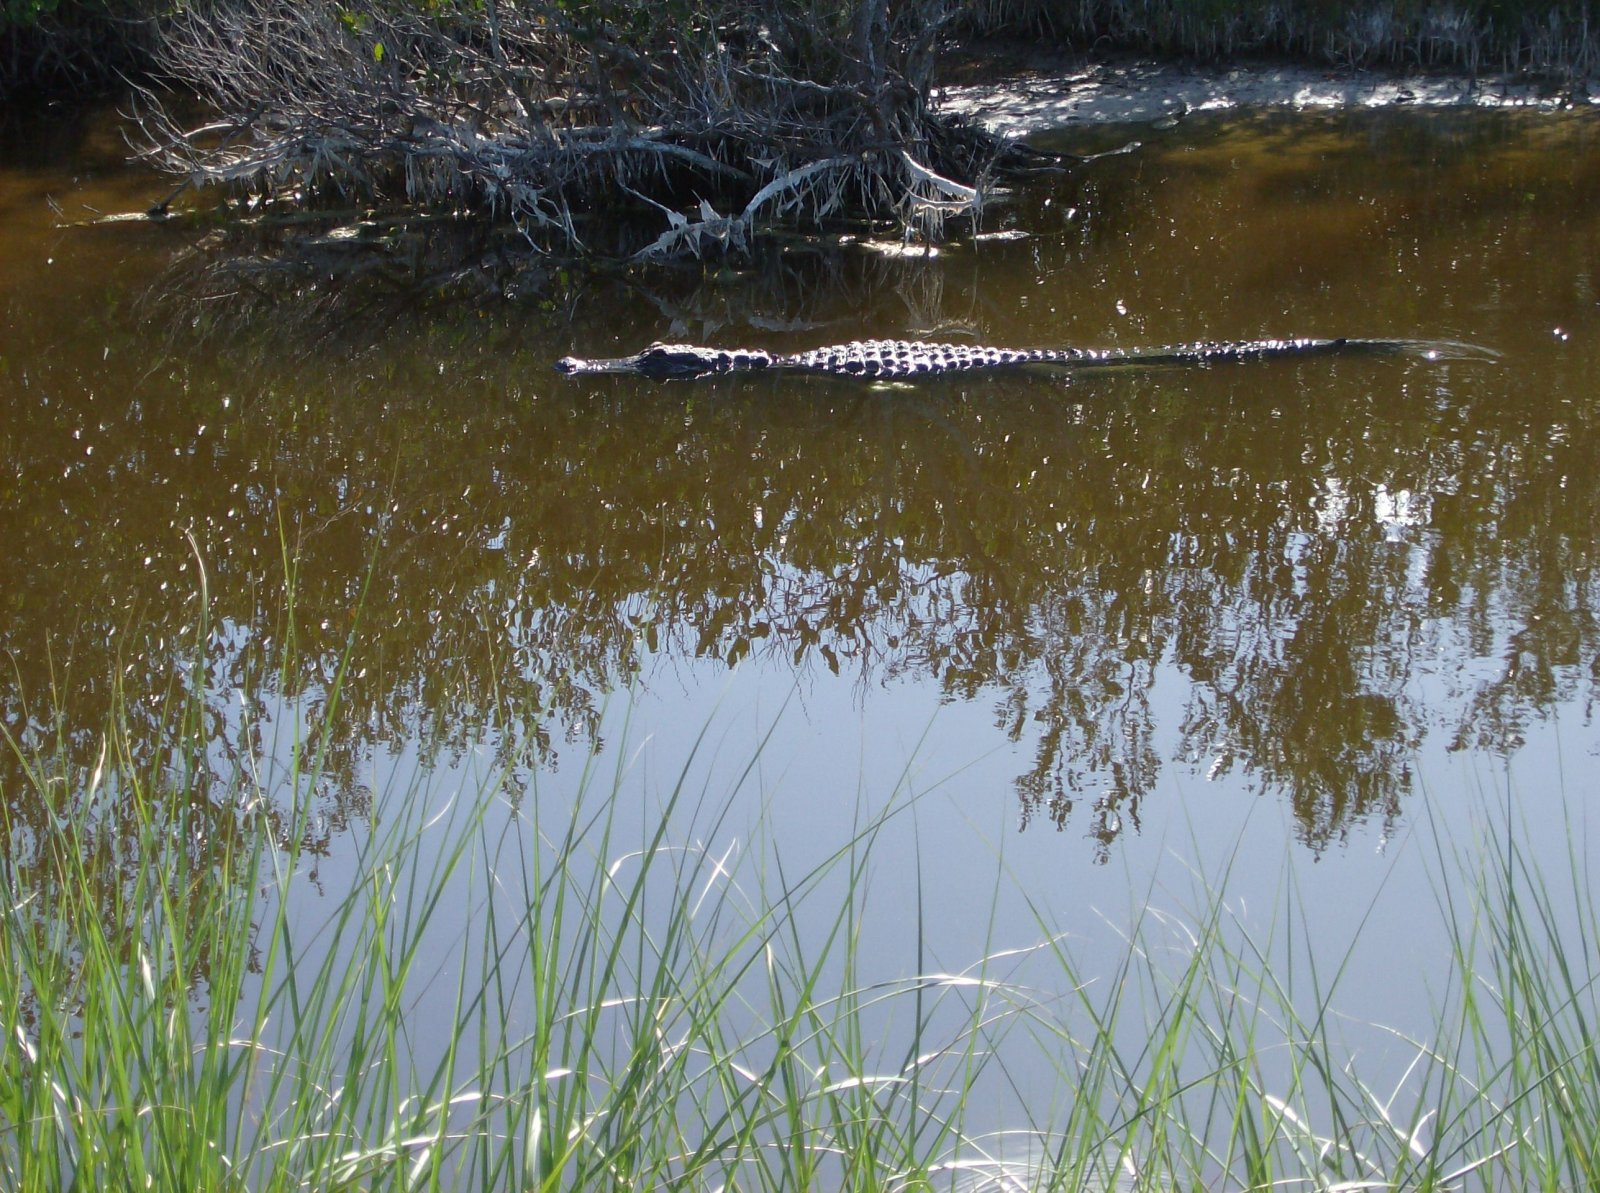 Click image for larger version  Name:Playalina Beach & Florida Gators 006.jpg Views:90 Size:438.4 KB ID:153349